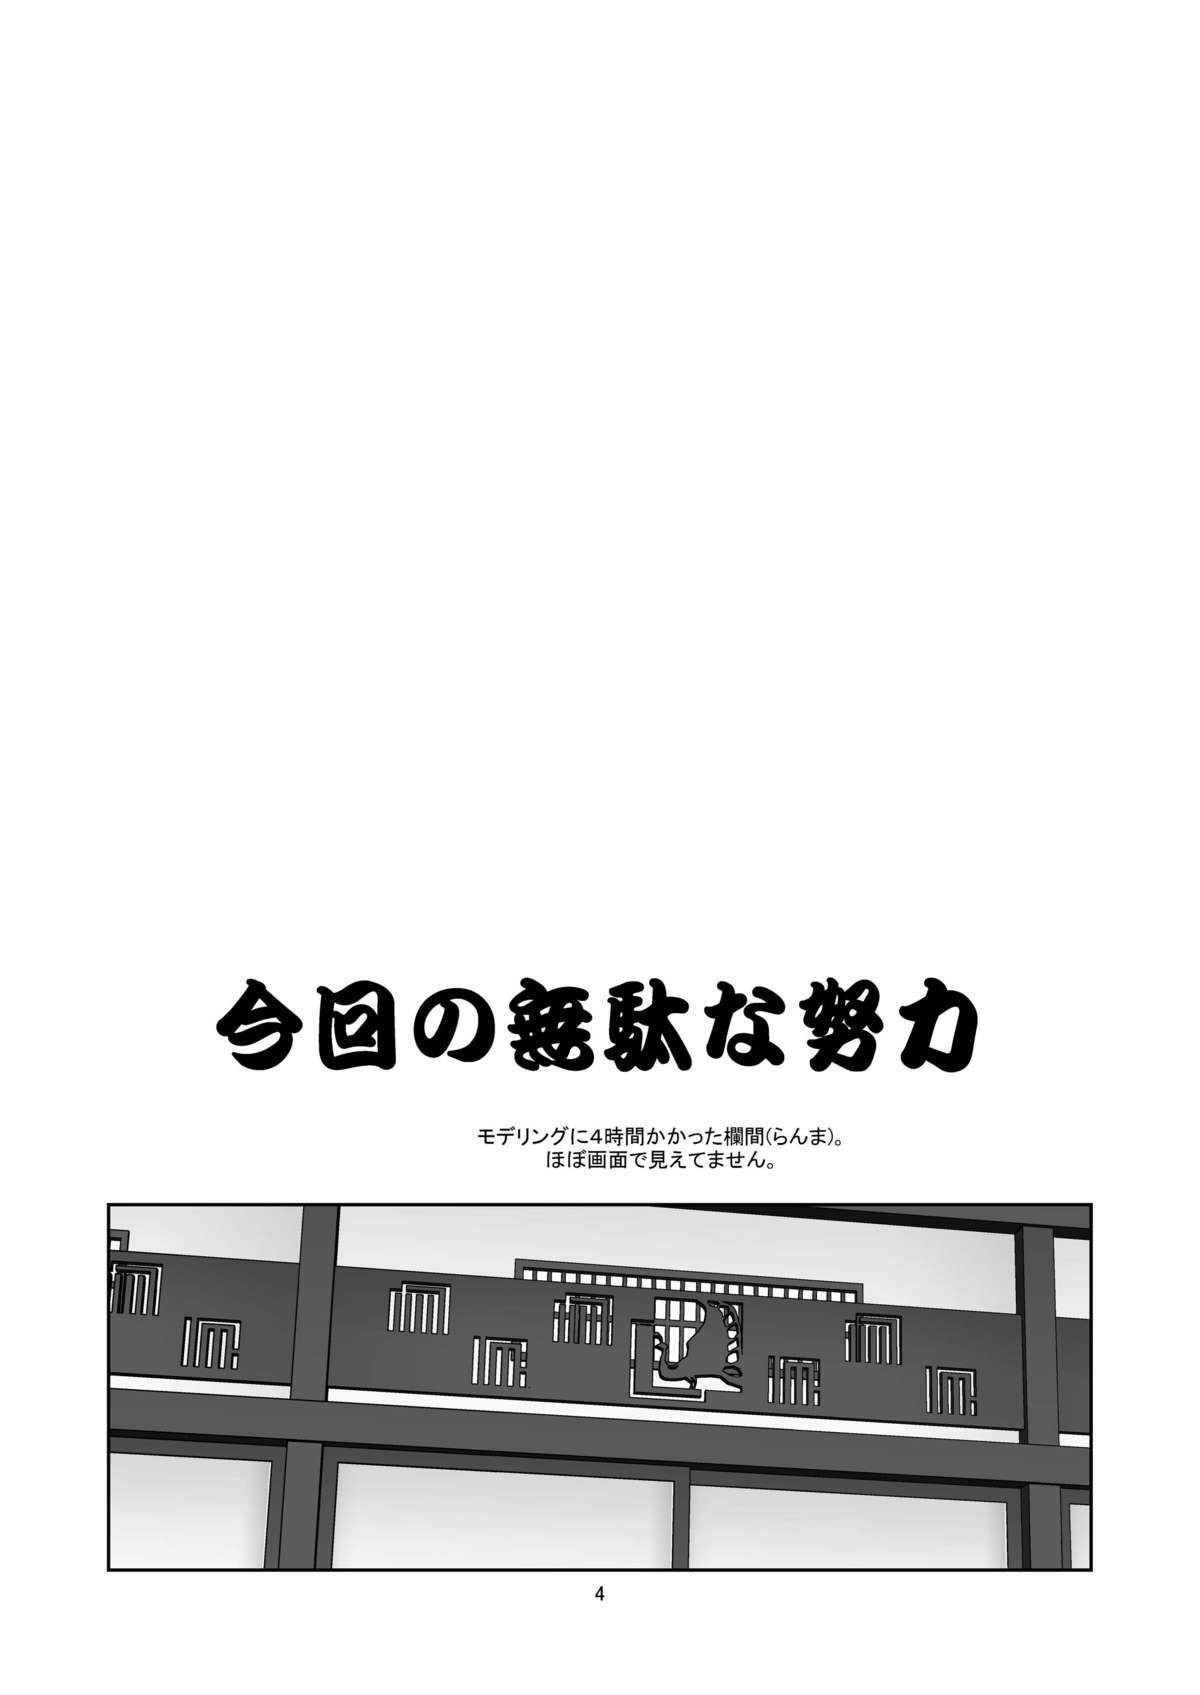 Nagamonogatari 2